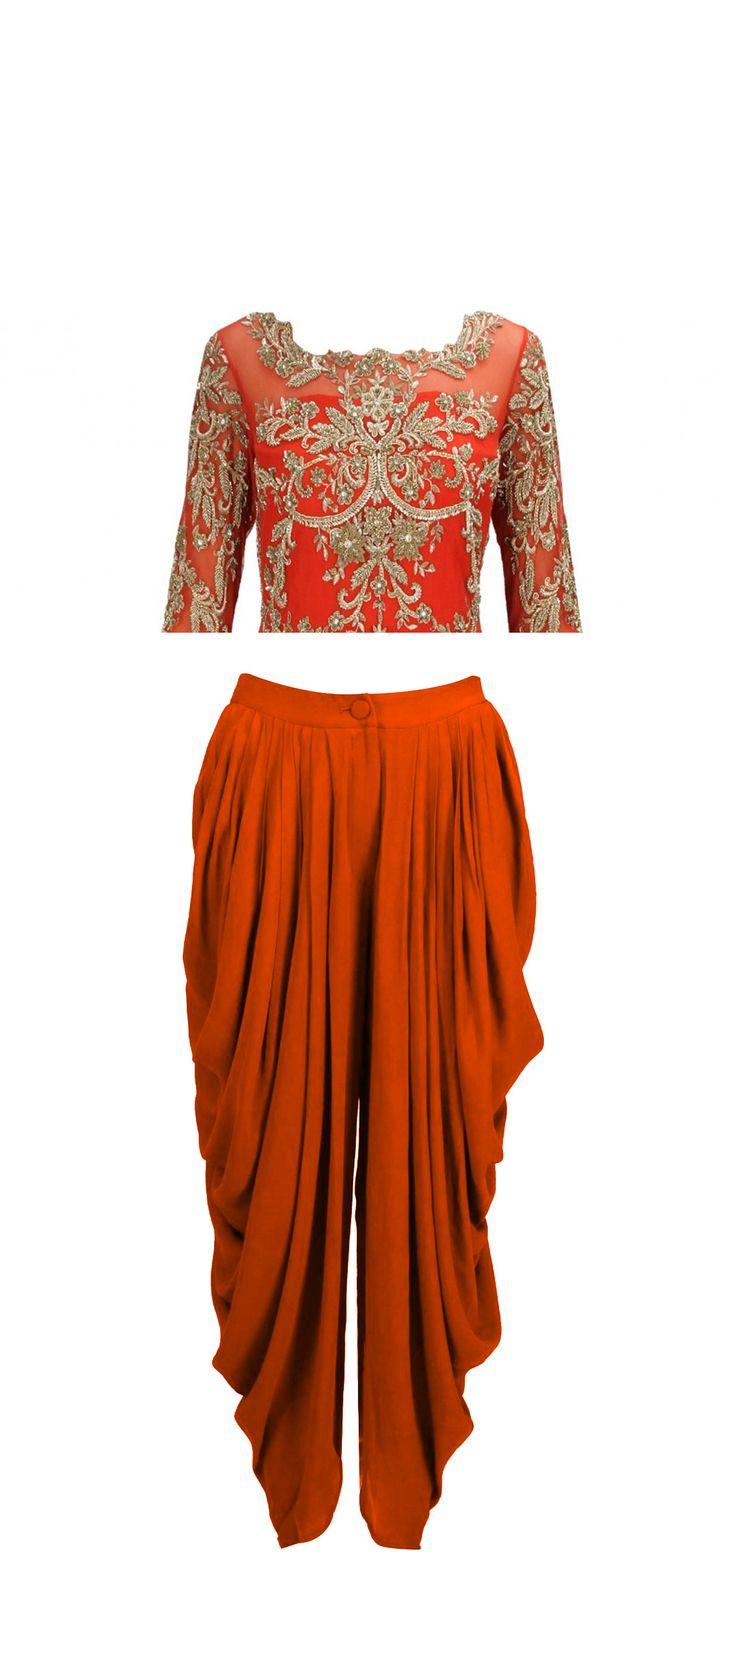 love this color combo, orange and silver. Perhaps a sari version?